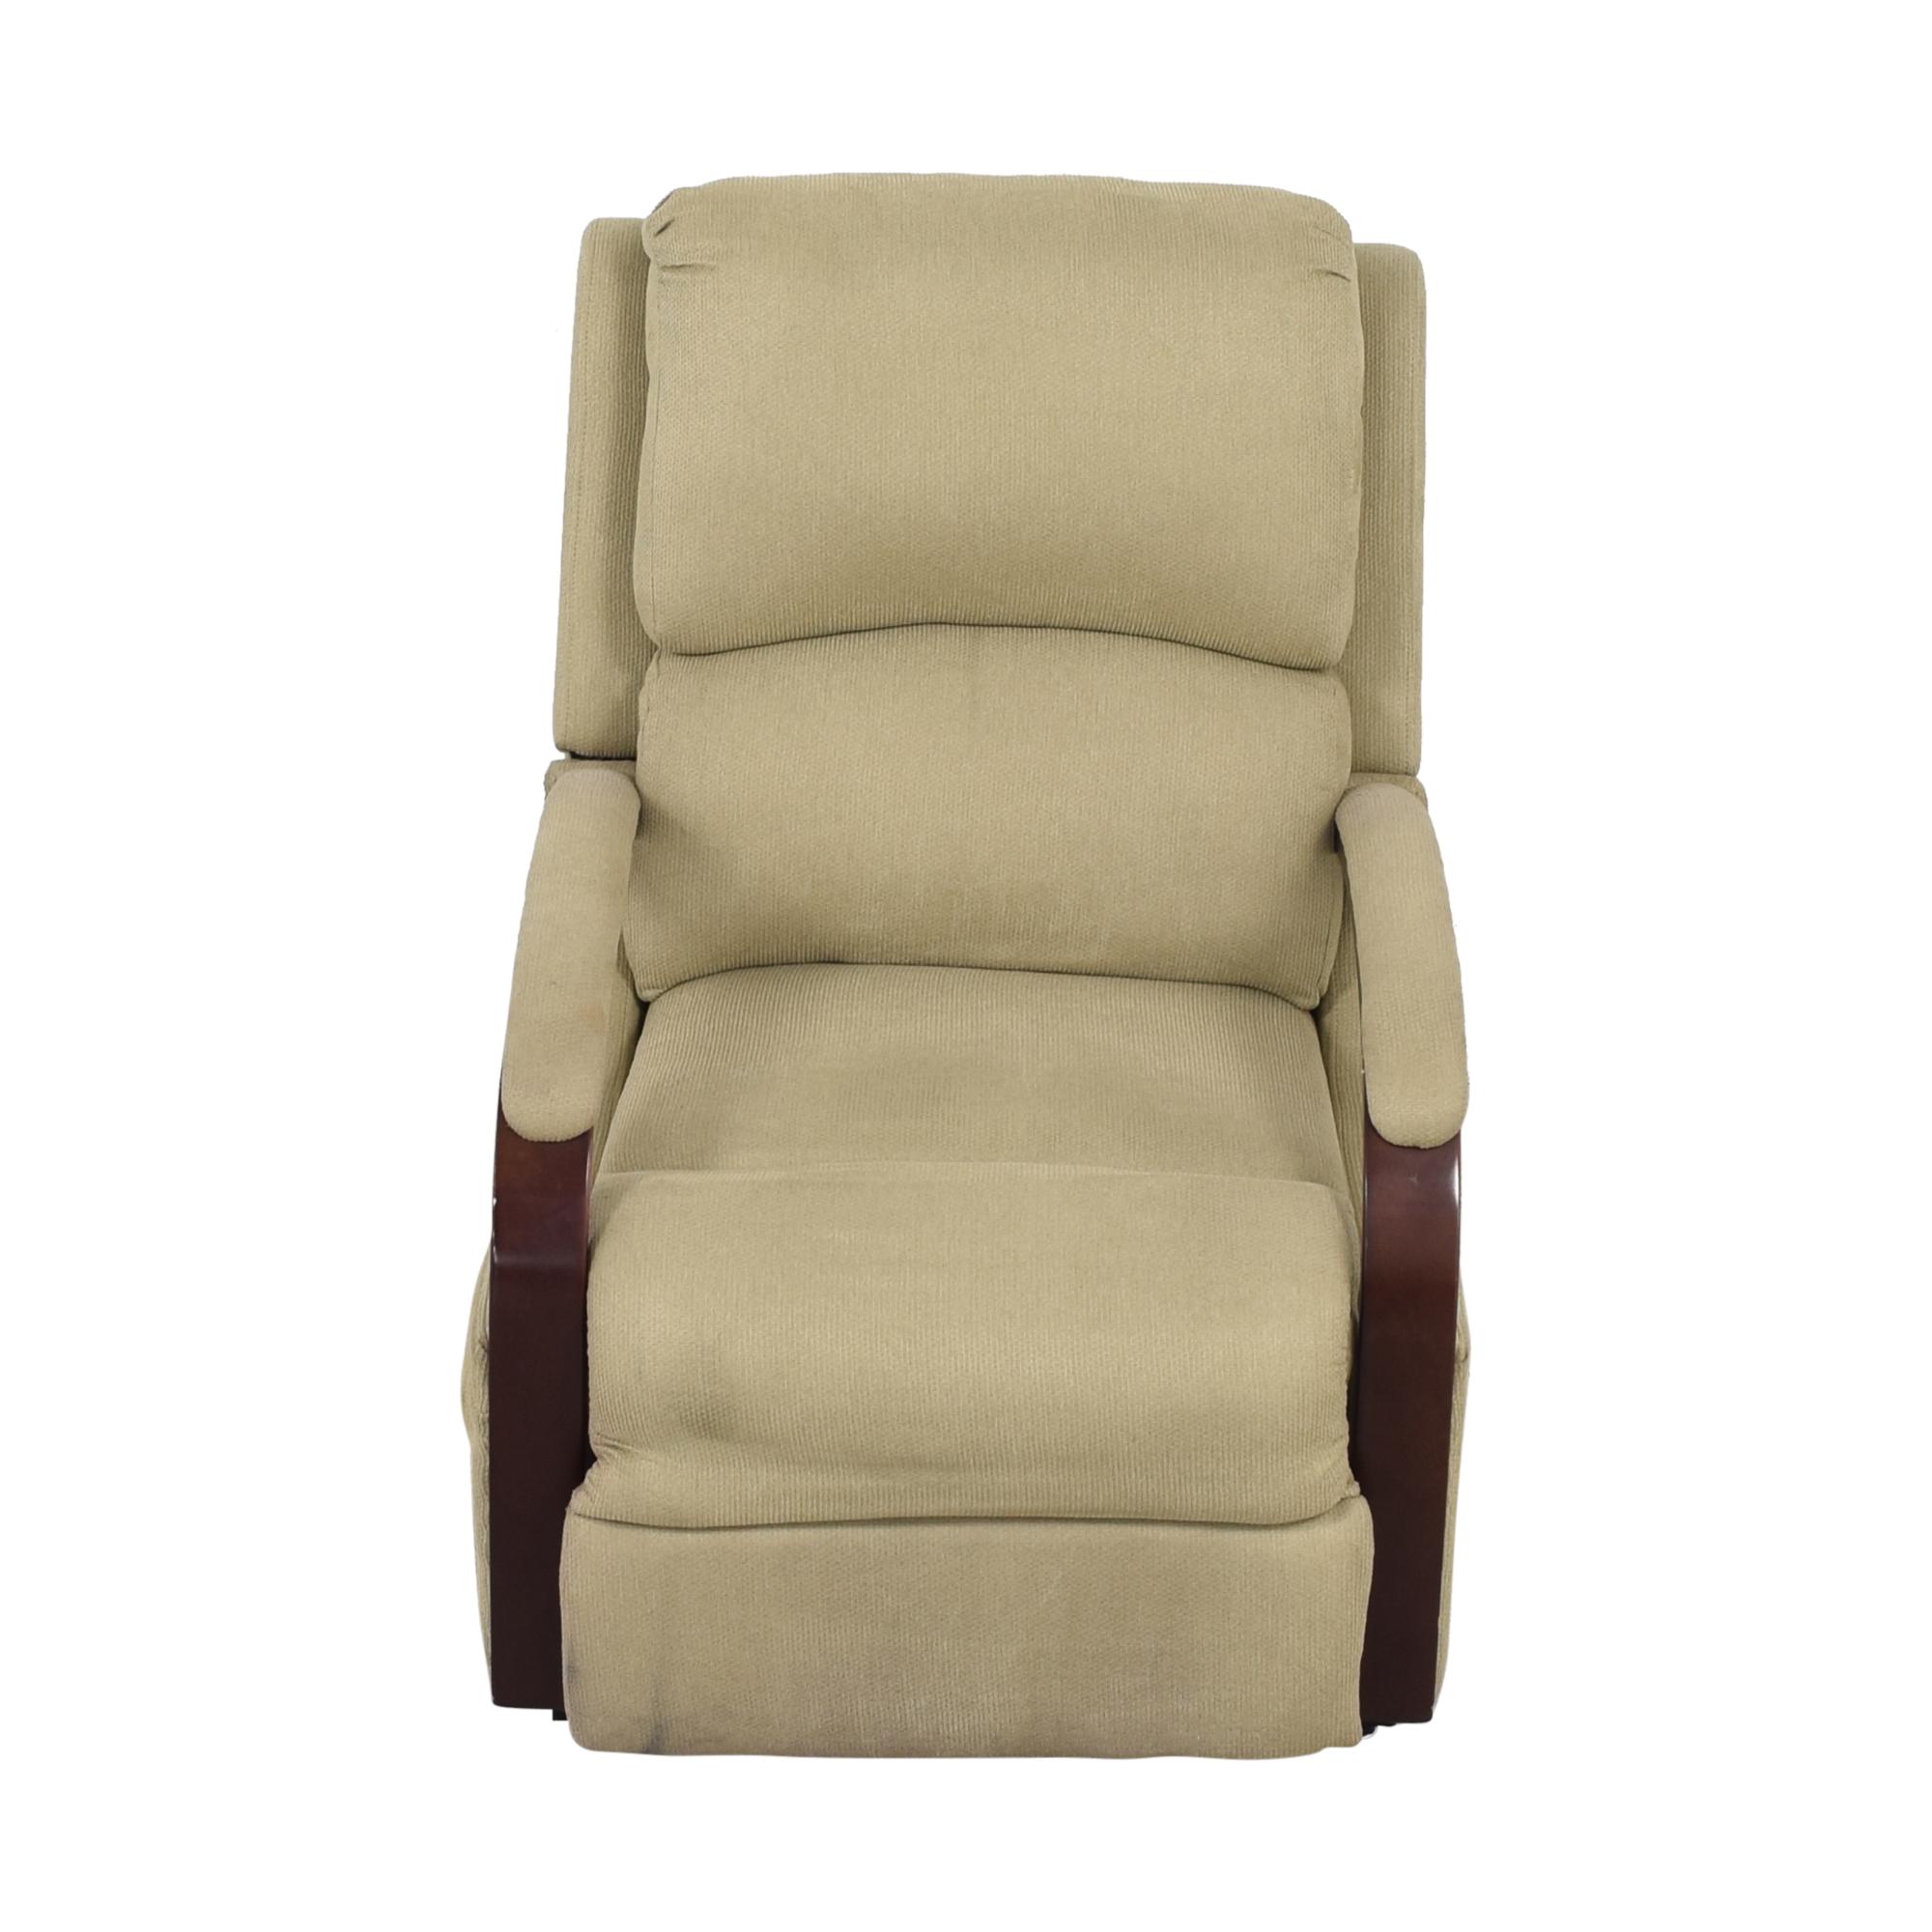 Macy's Macy's Power Lift Recliner Chair ct